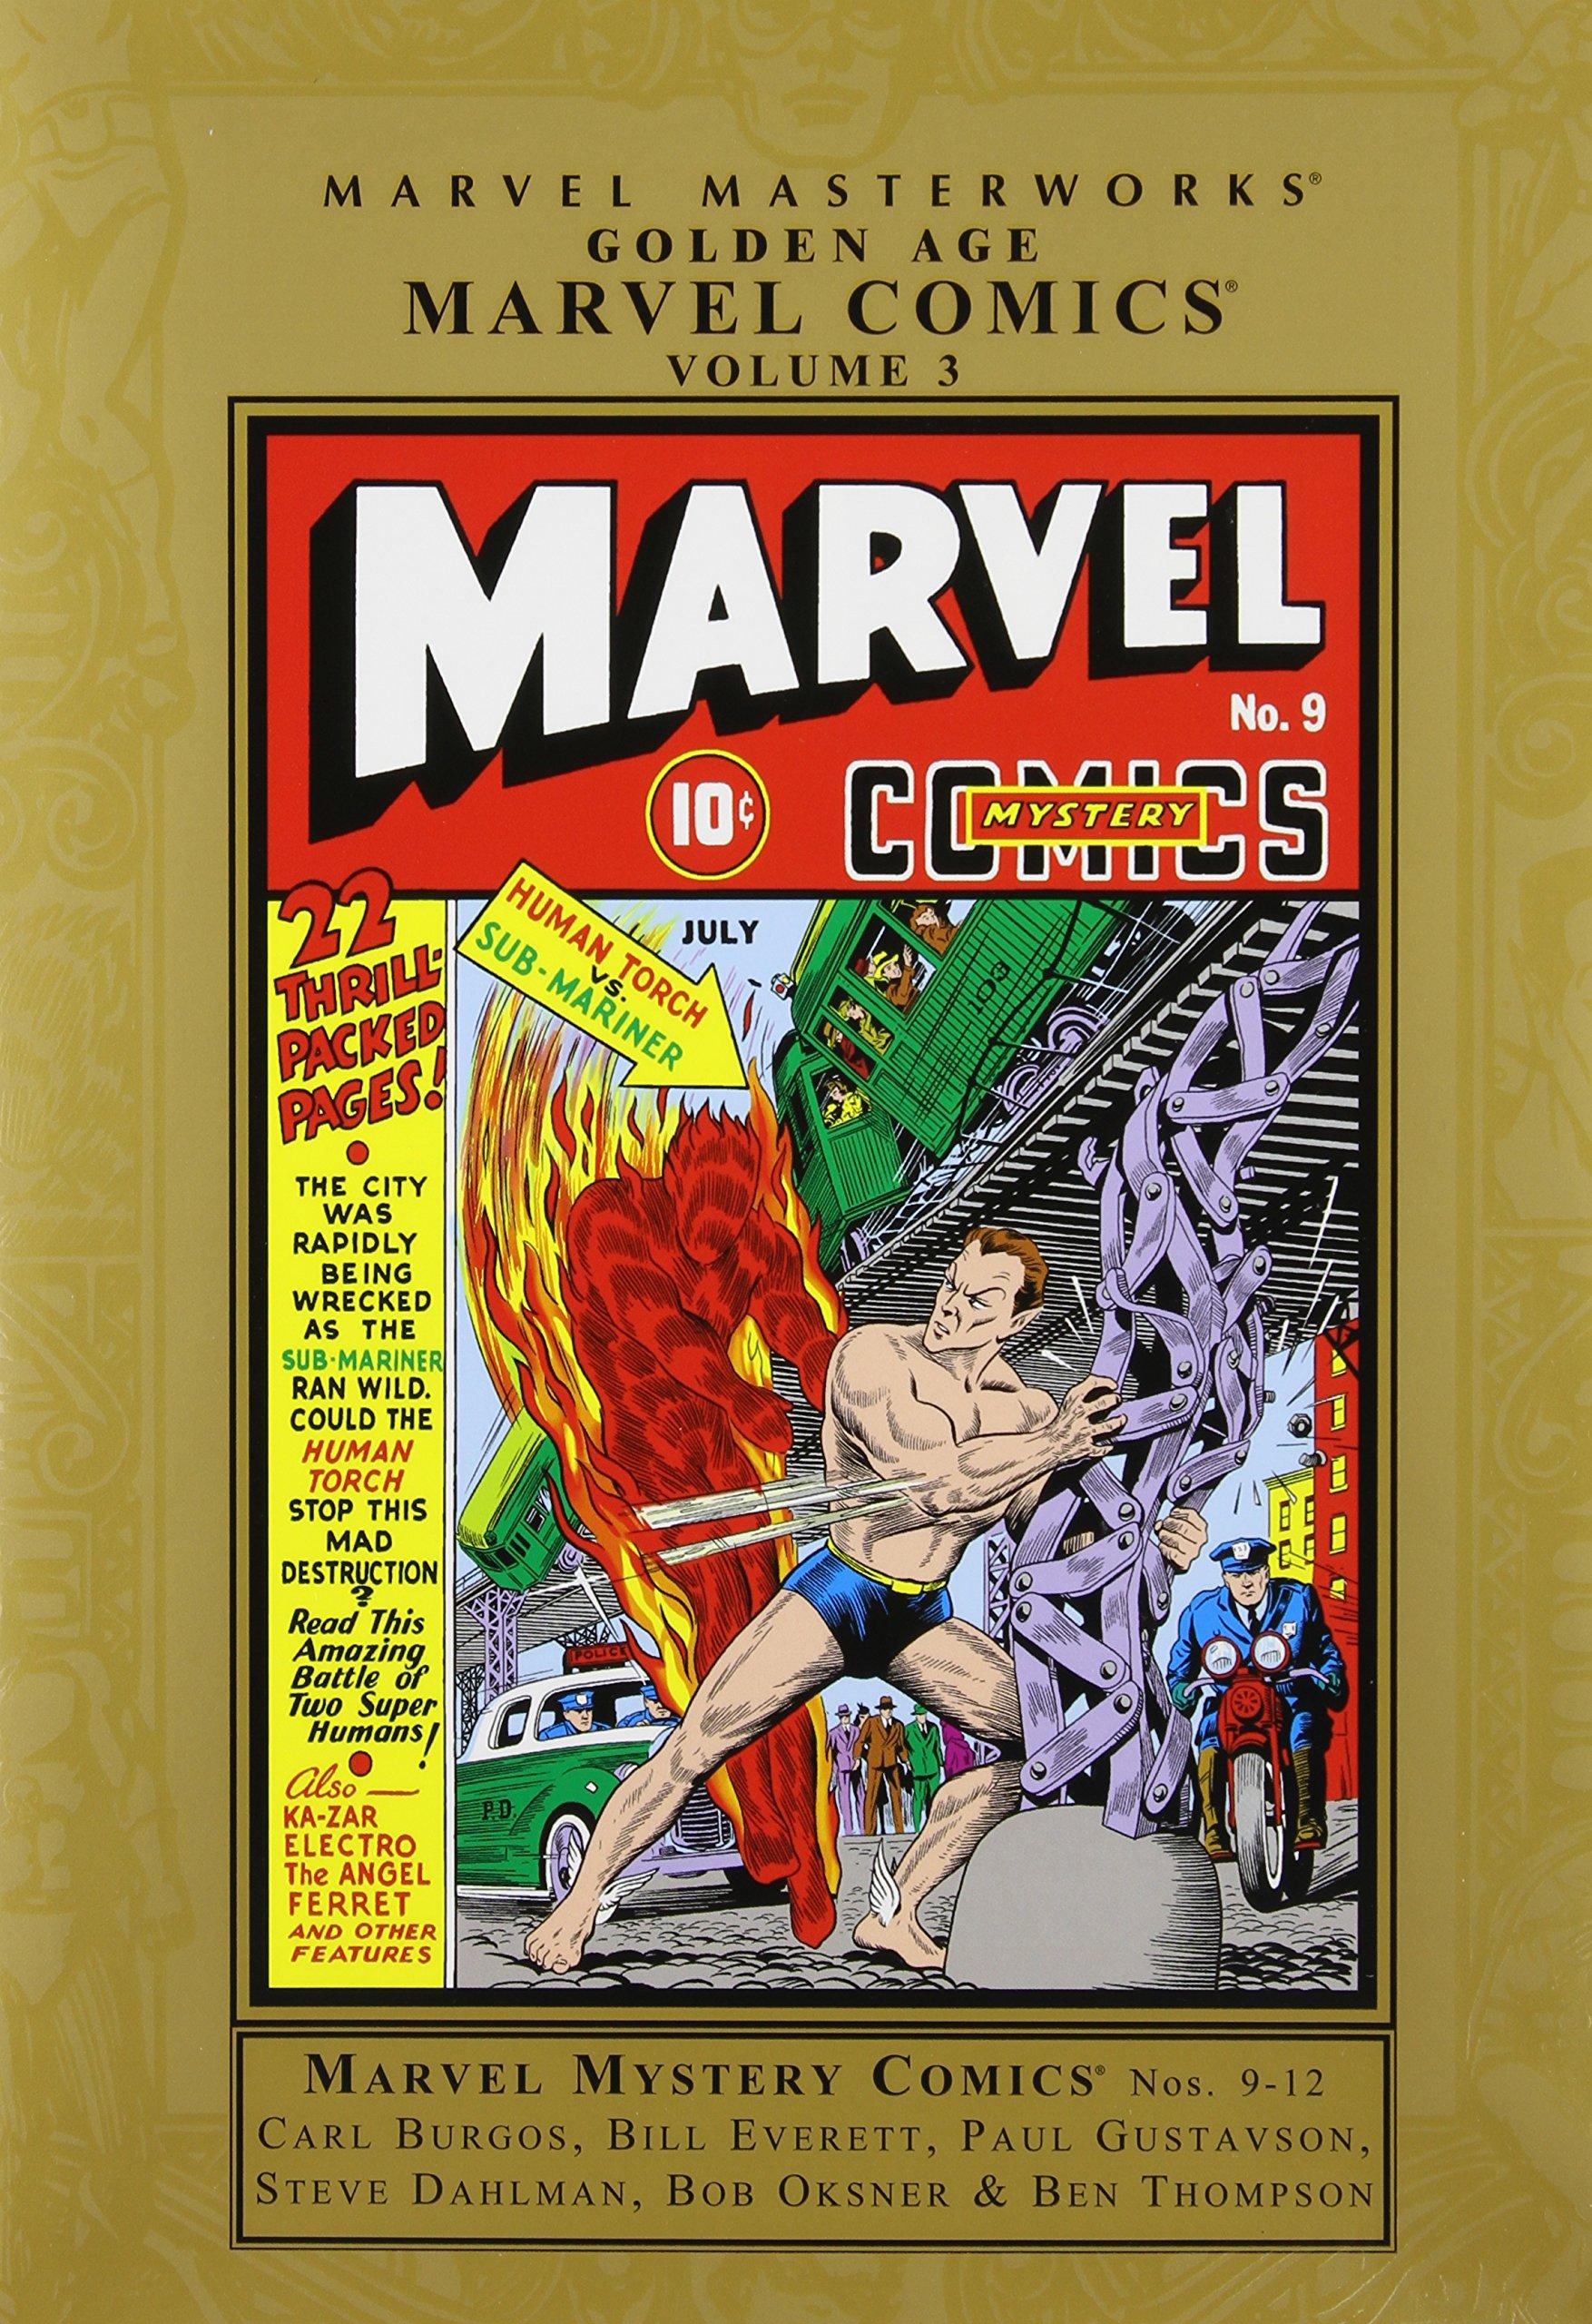 Marvel Masterworks: Golden Age Marvel Comics, Vol. 3 PDF